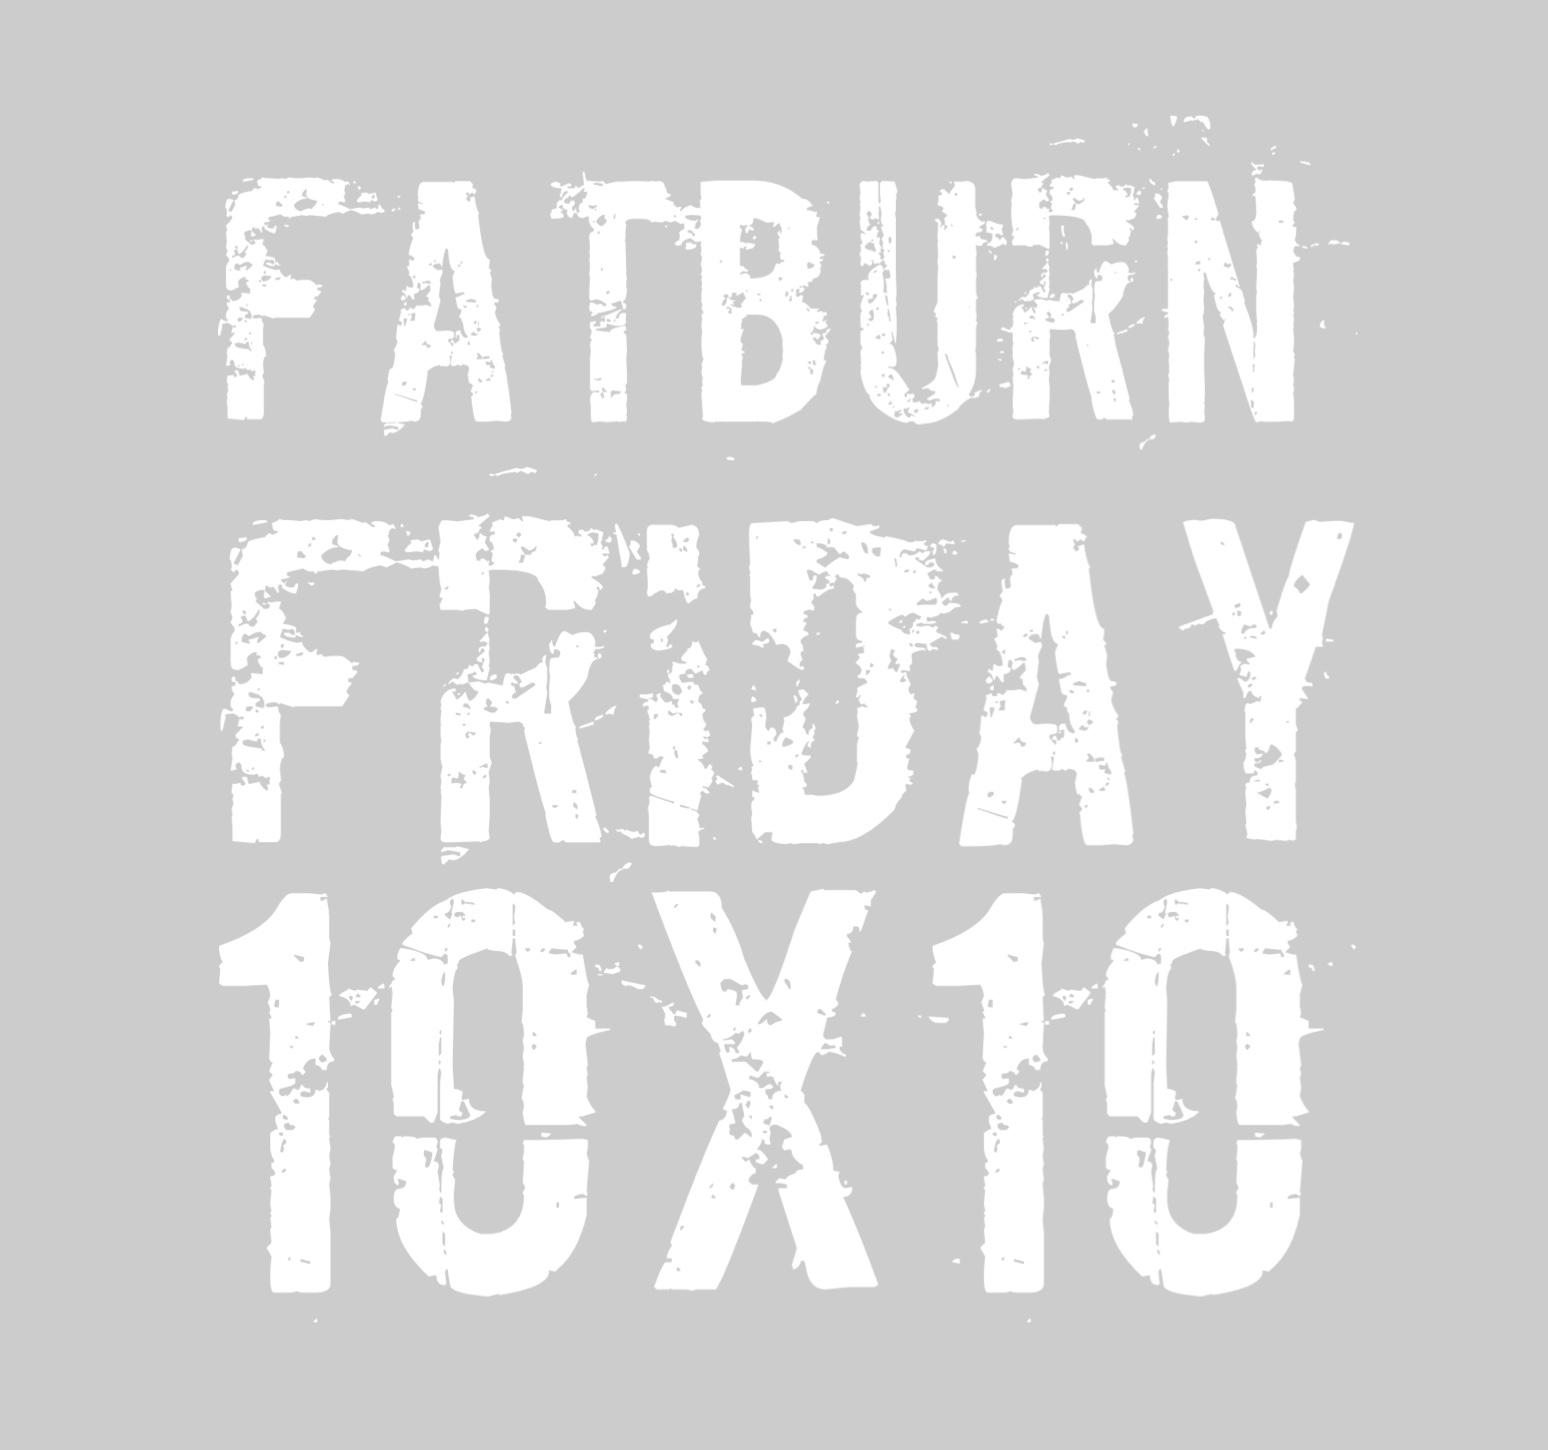 FATBURN friday 10×10